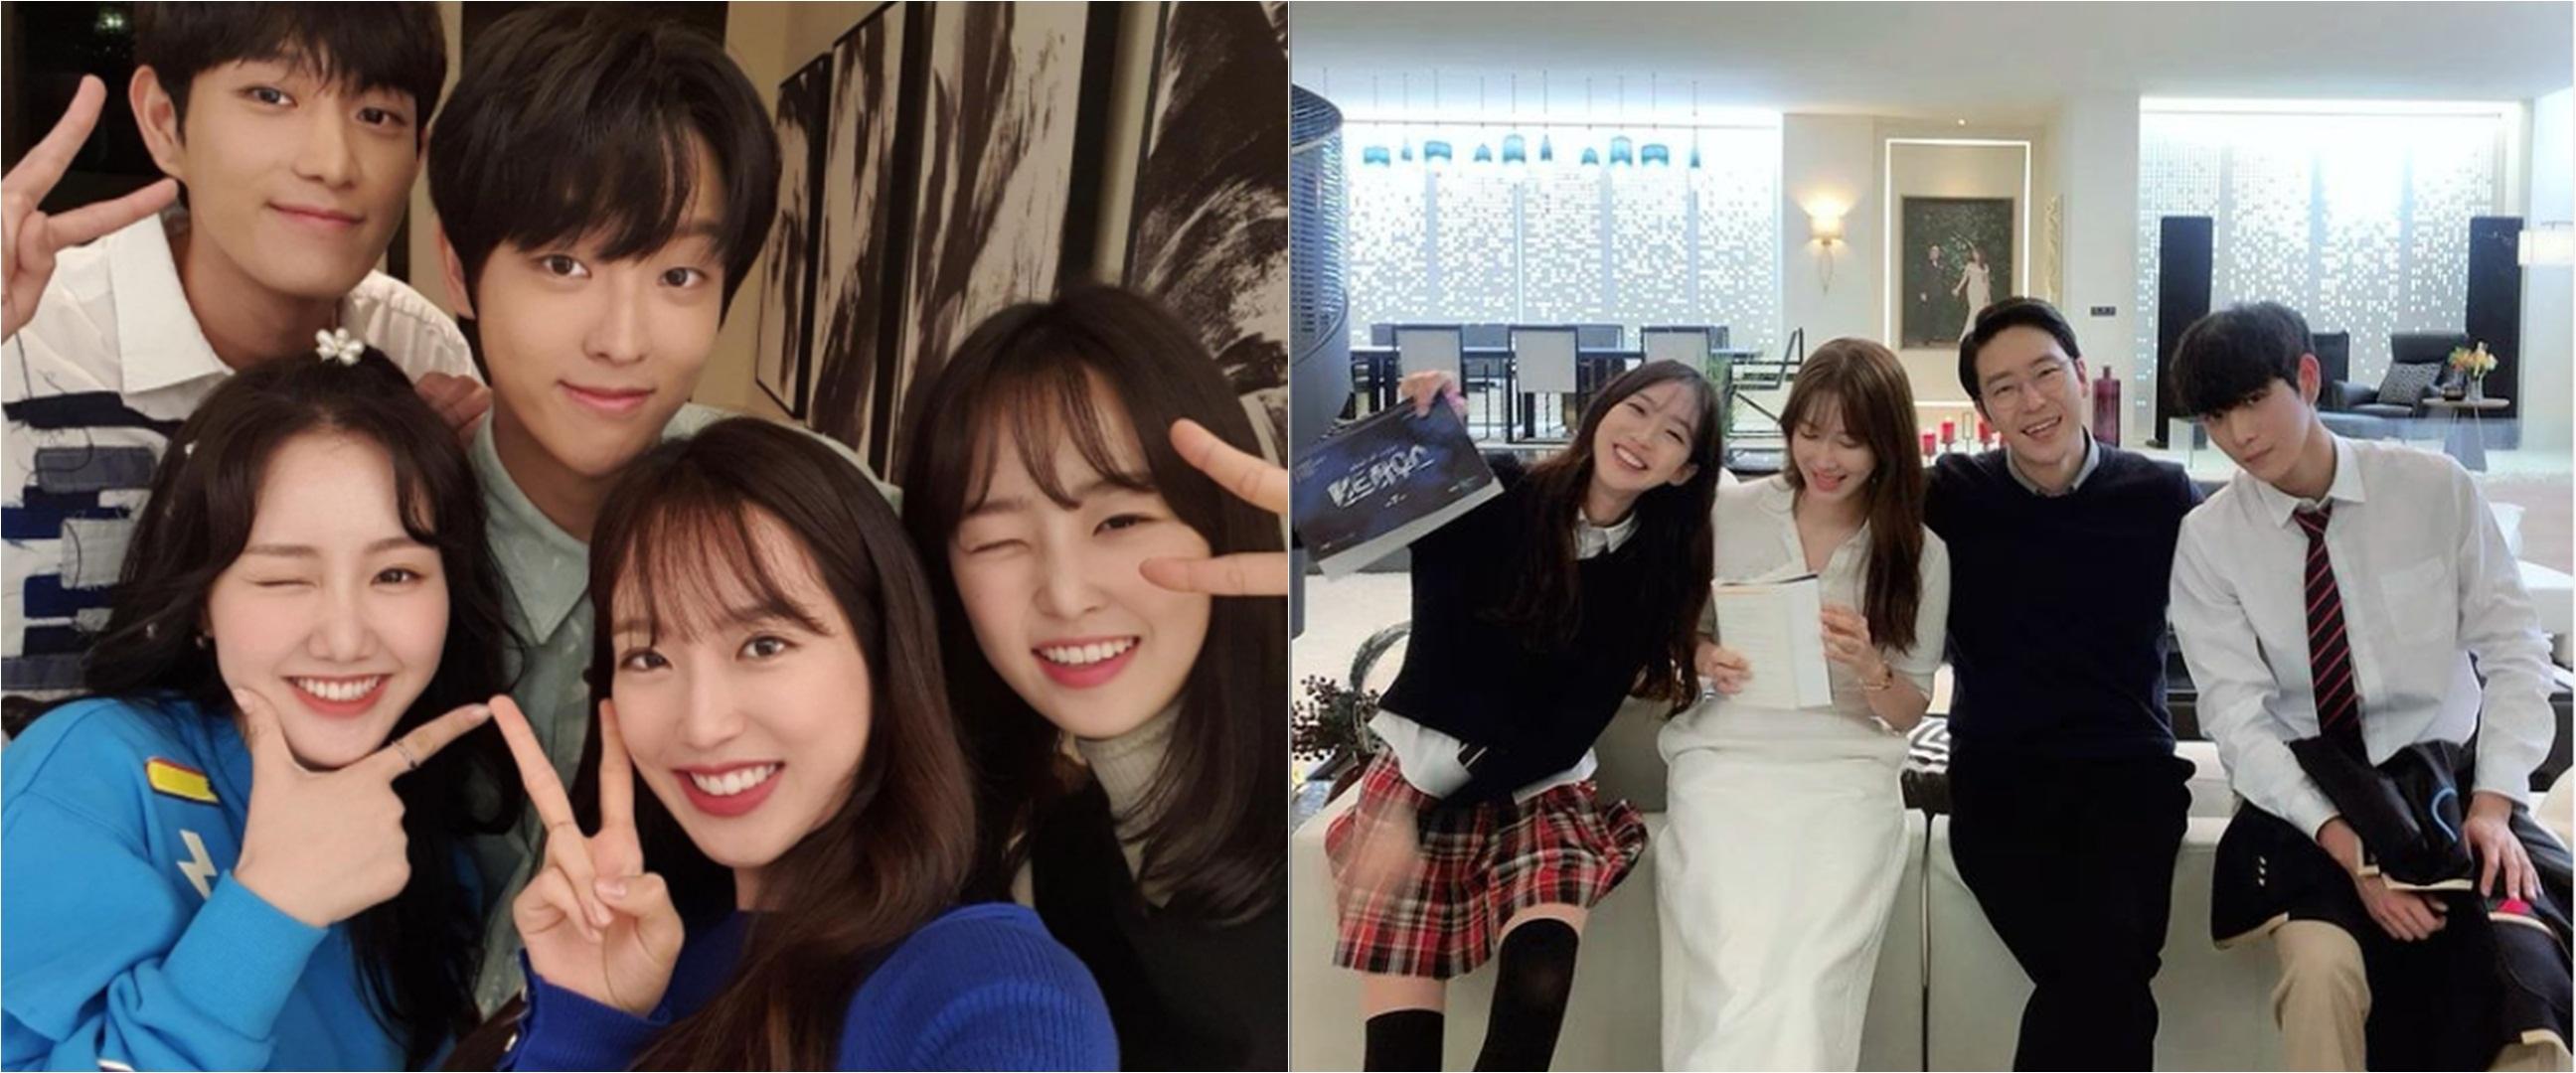 8 Potret kompak pemain drama Korea The Penthouse di luar syuting